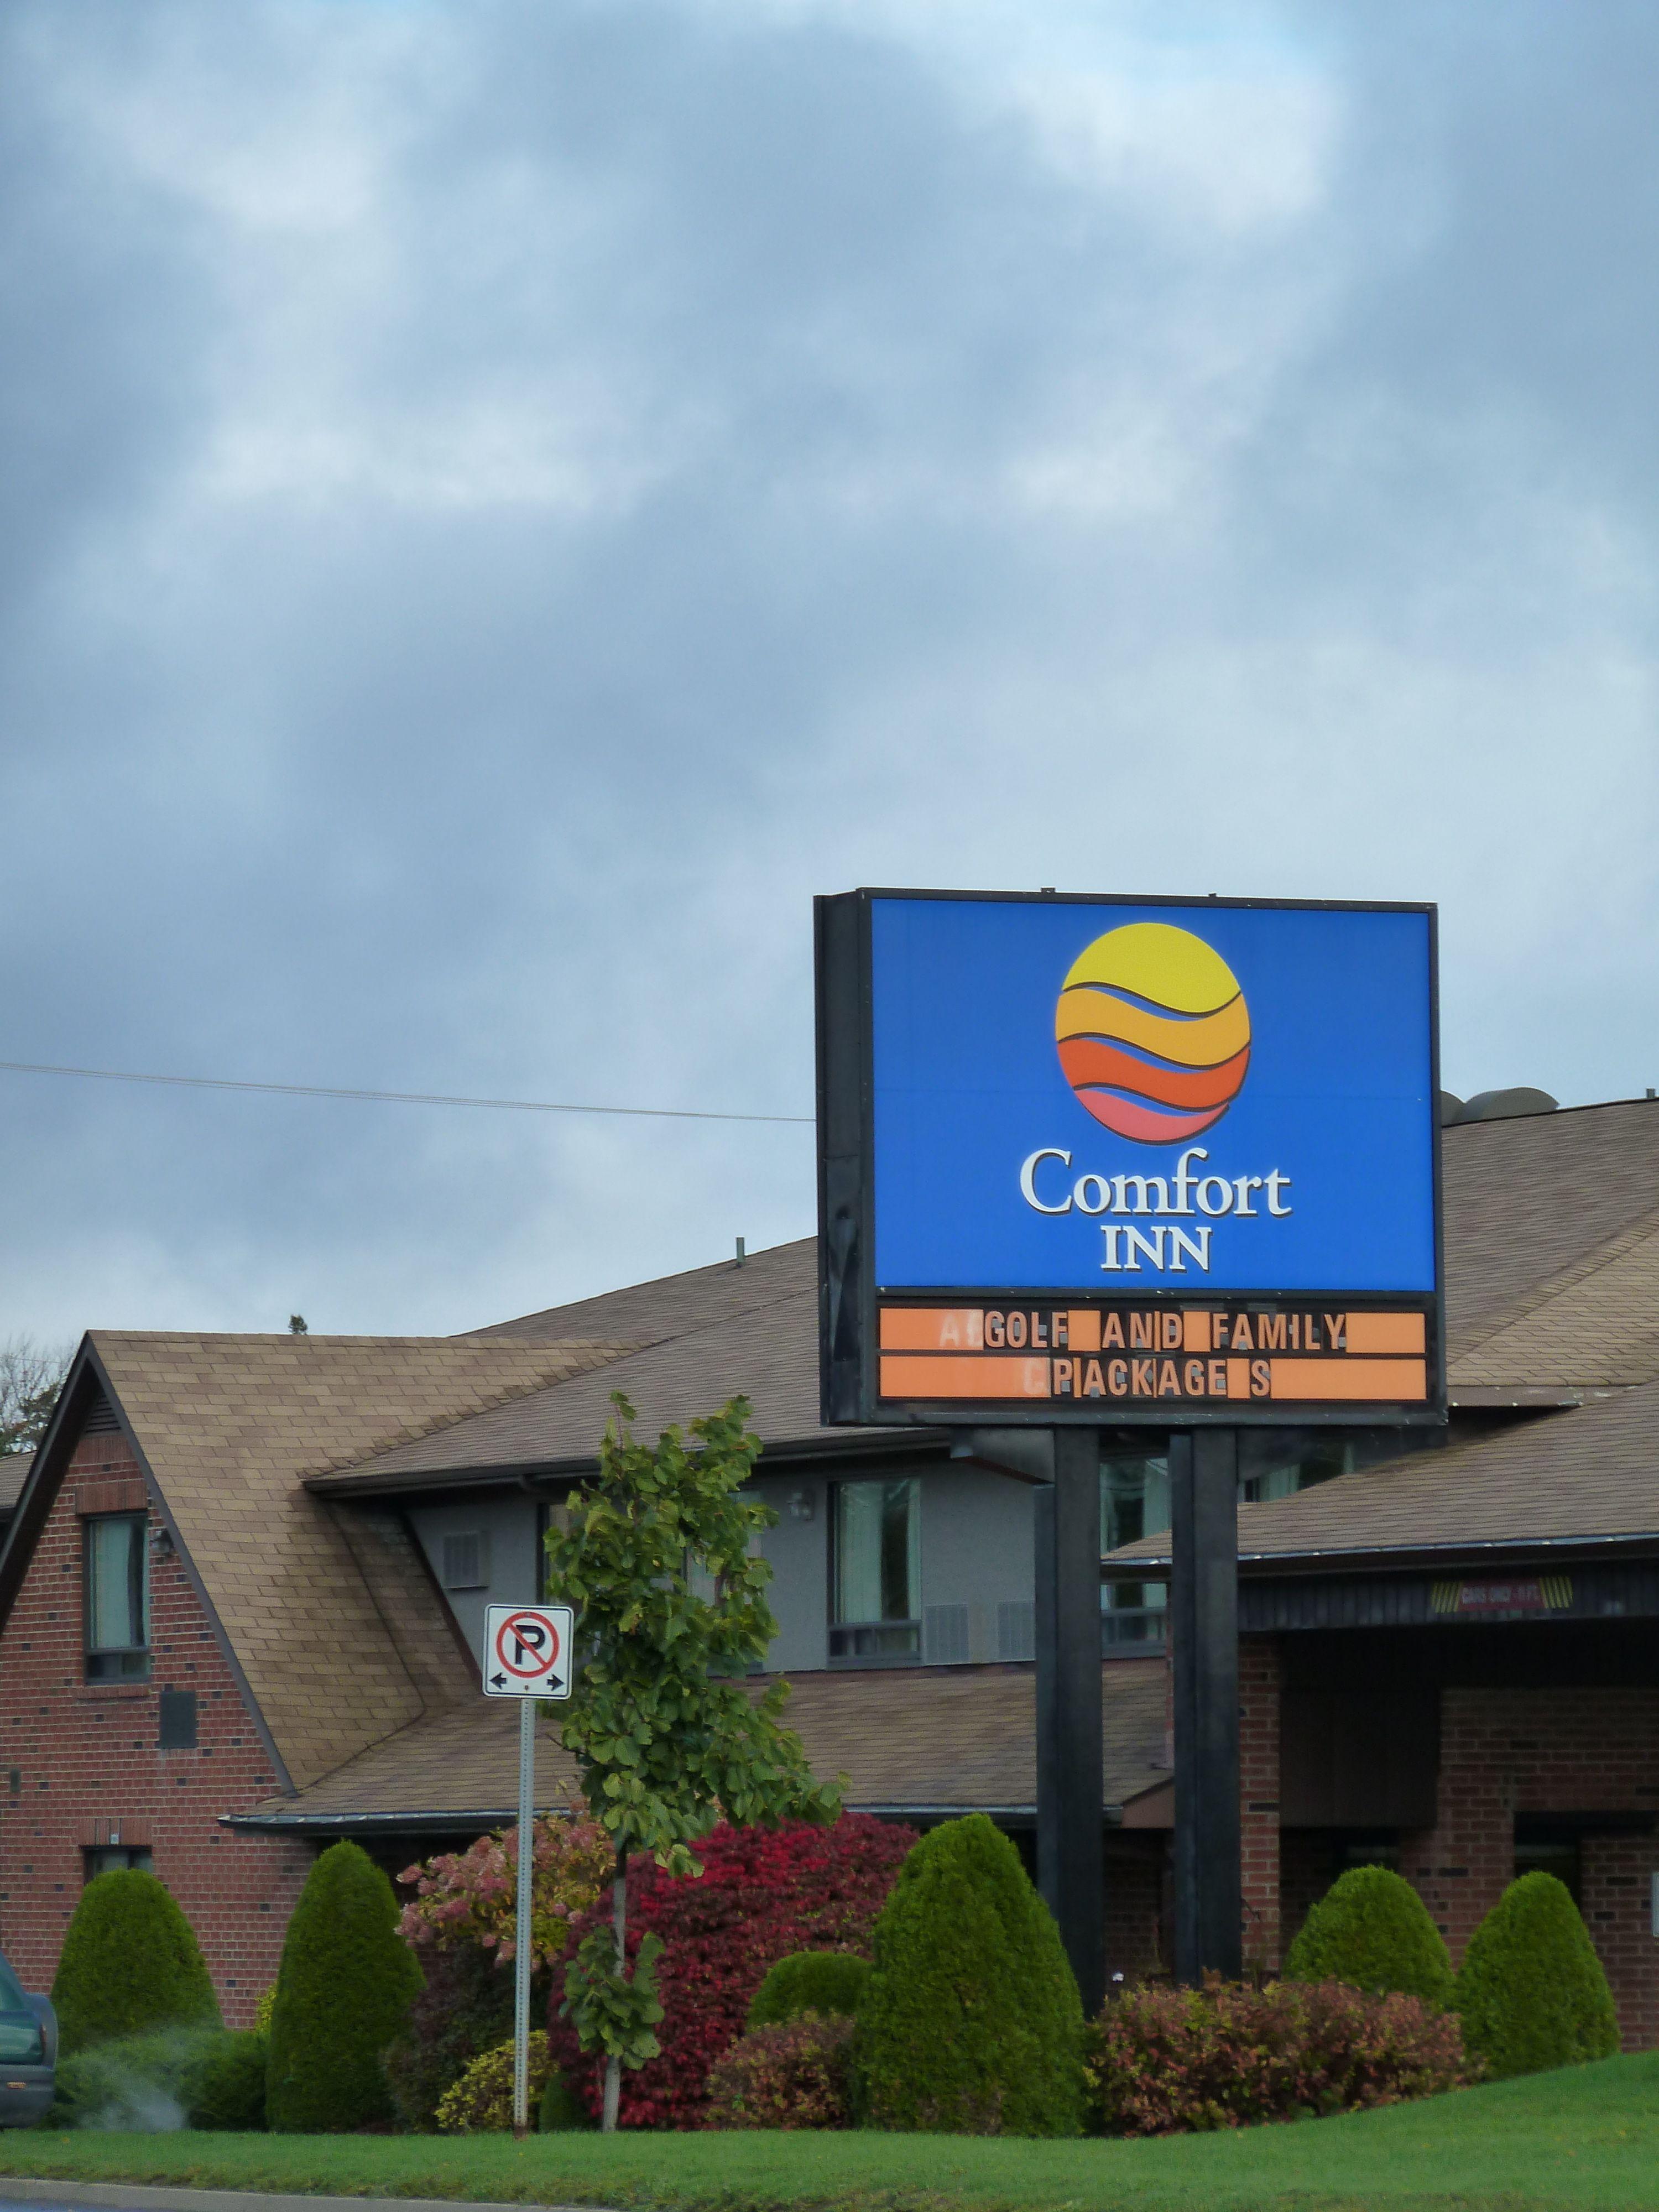 Comfort Inn Fredericton New Brunswick Fredericton New